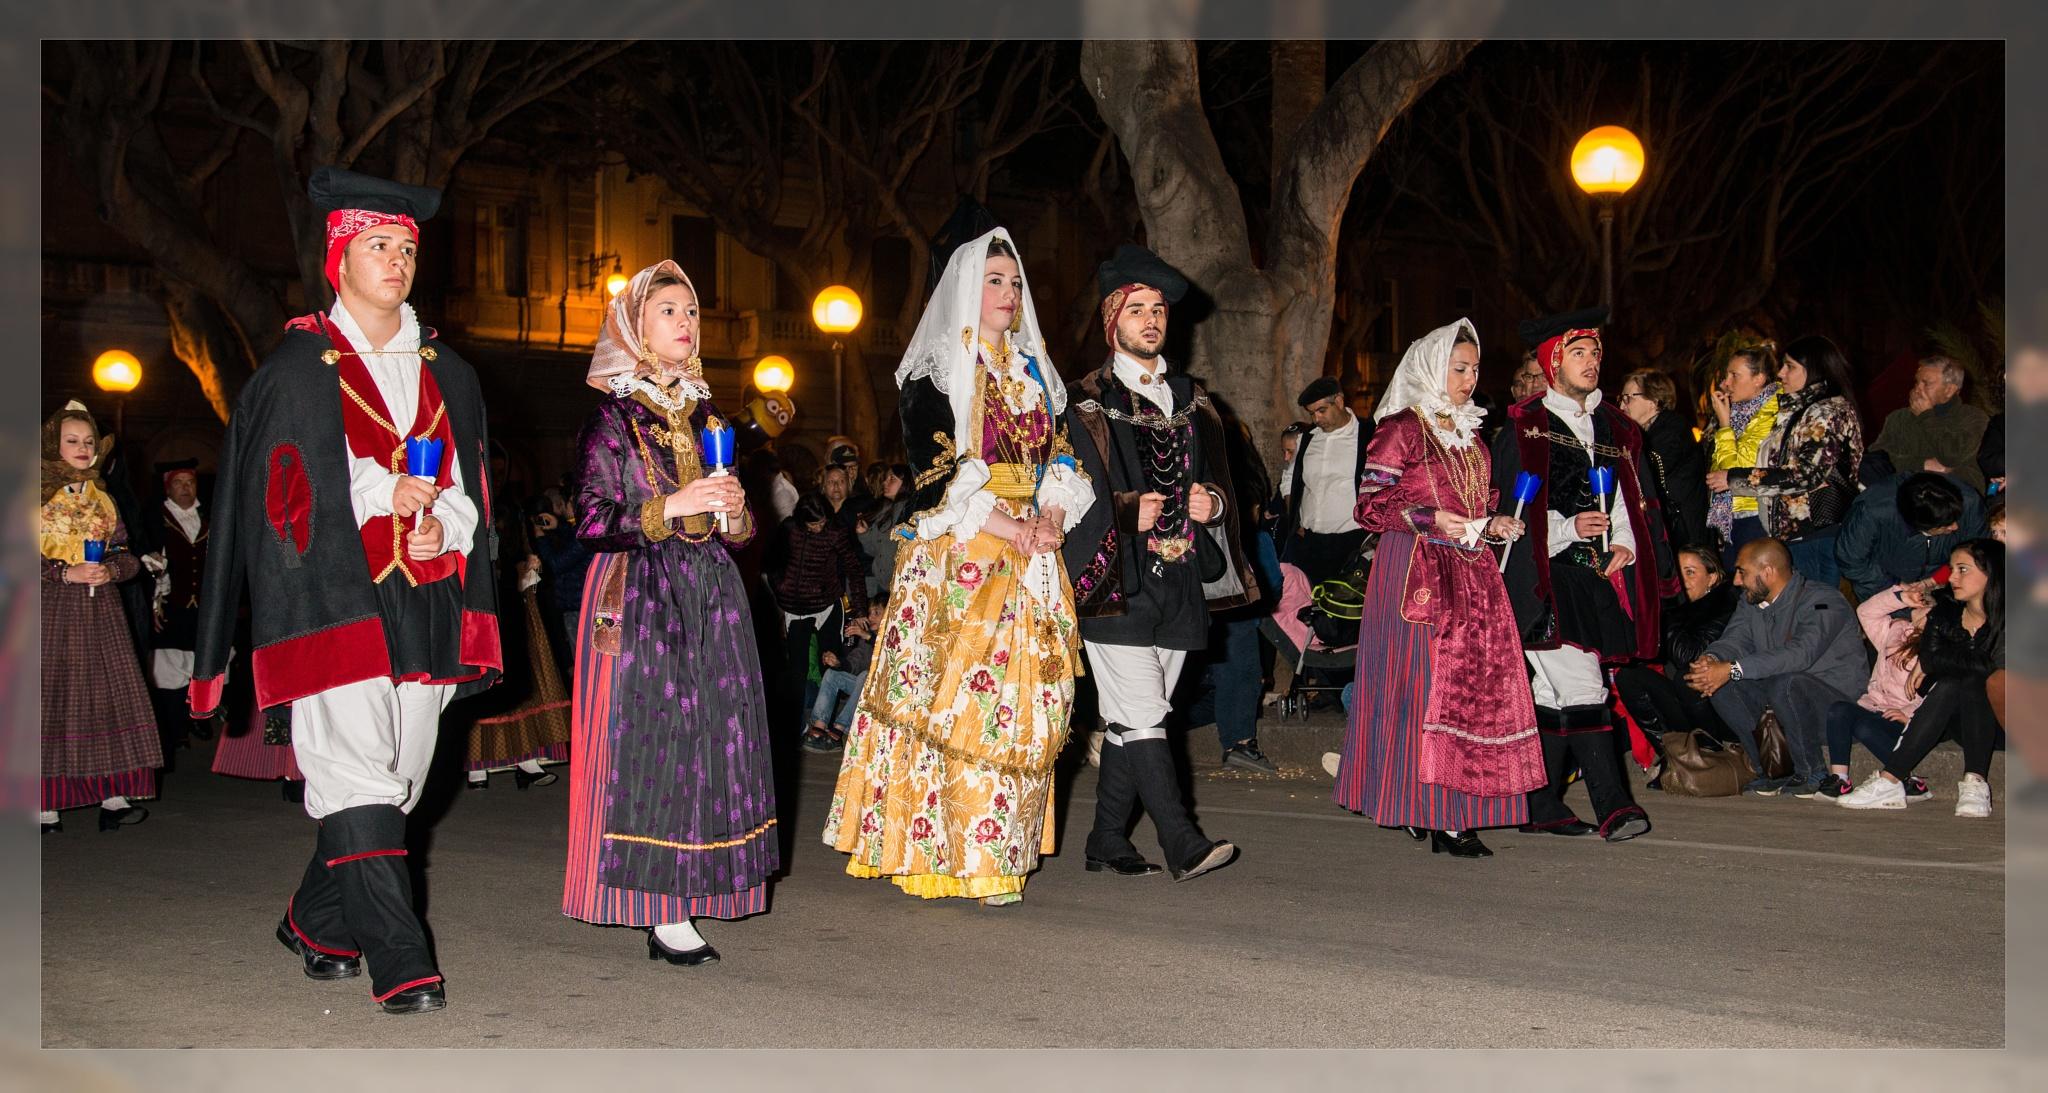 Costumi Sardi (Settimo San Pietro) by corvonero